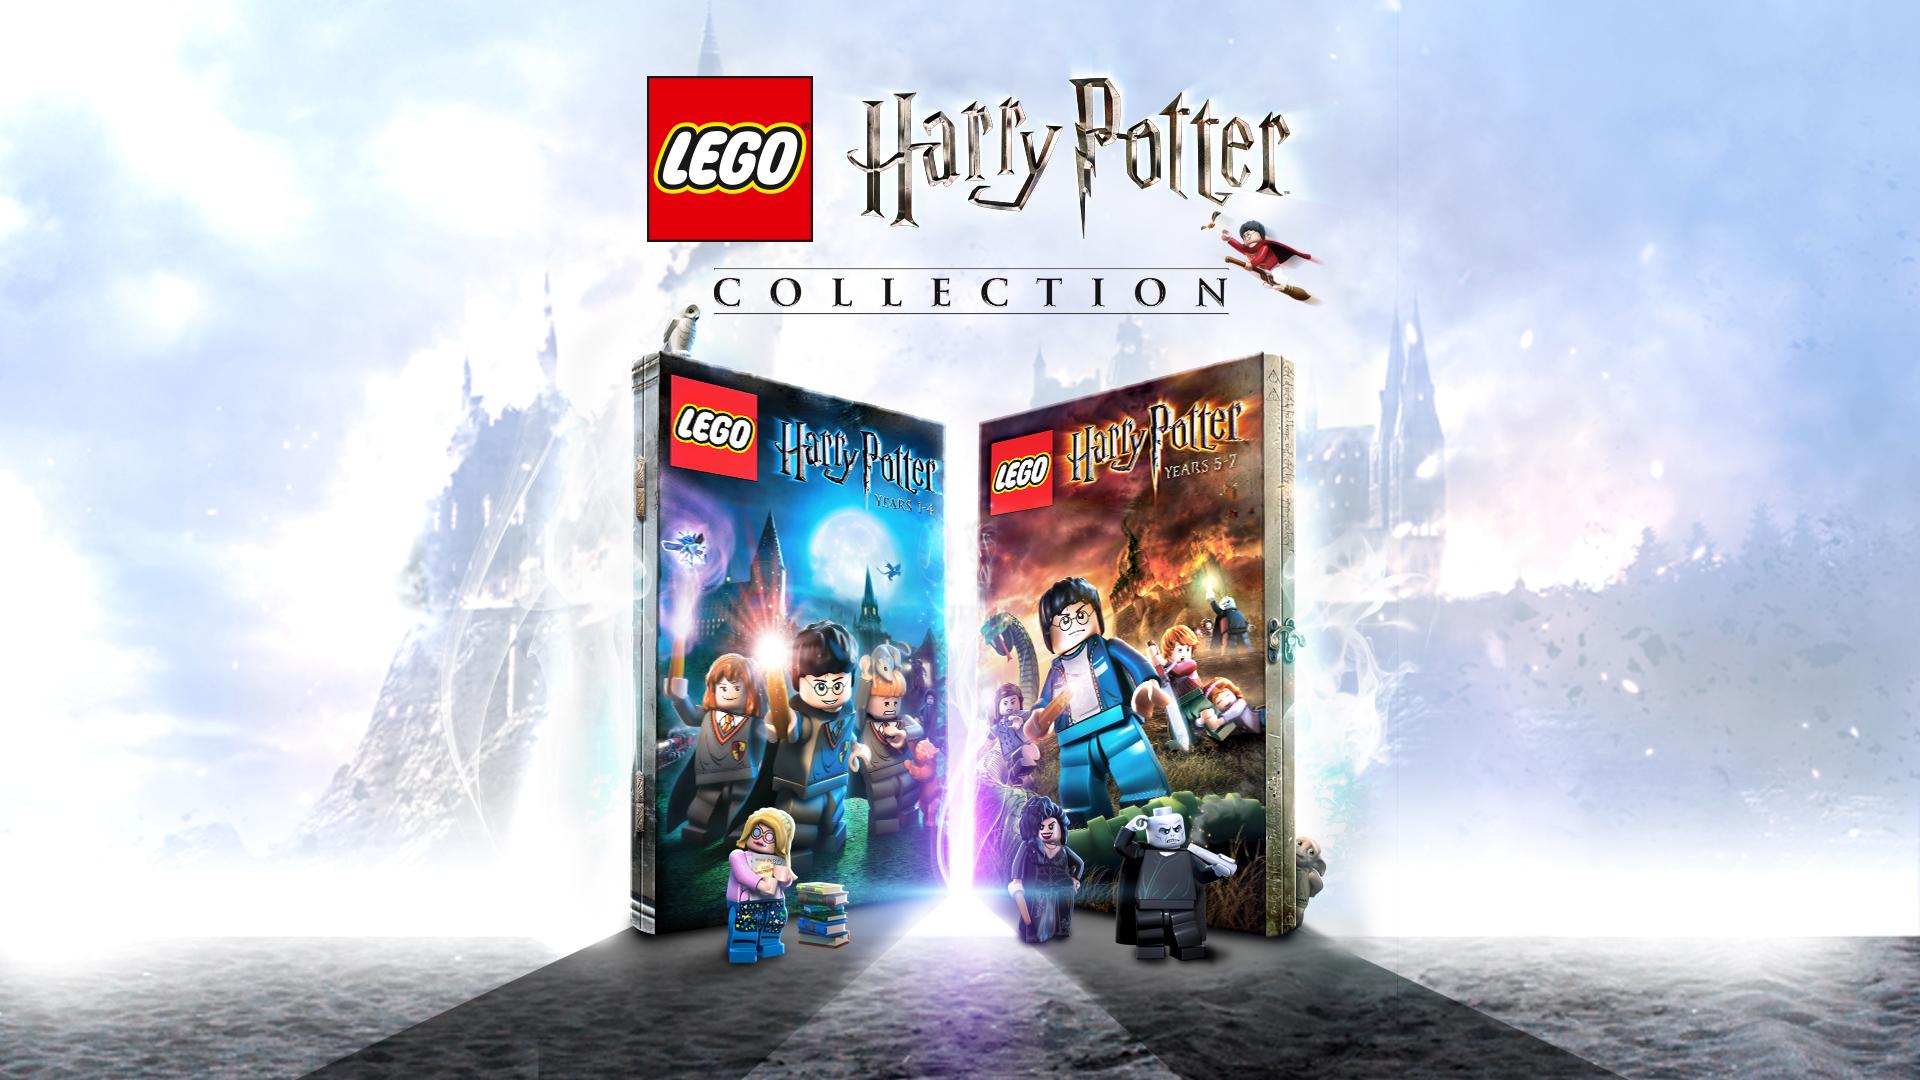 Lego Harry Potter Collection - Nintendo Switch Canada store/Eneba (Digital download) £12.81 @ EShop